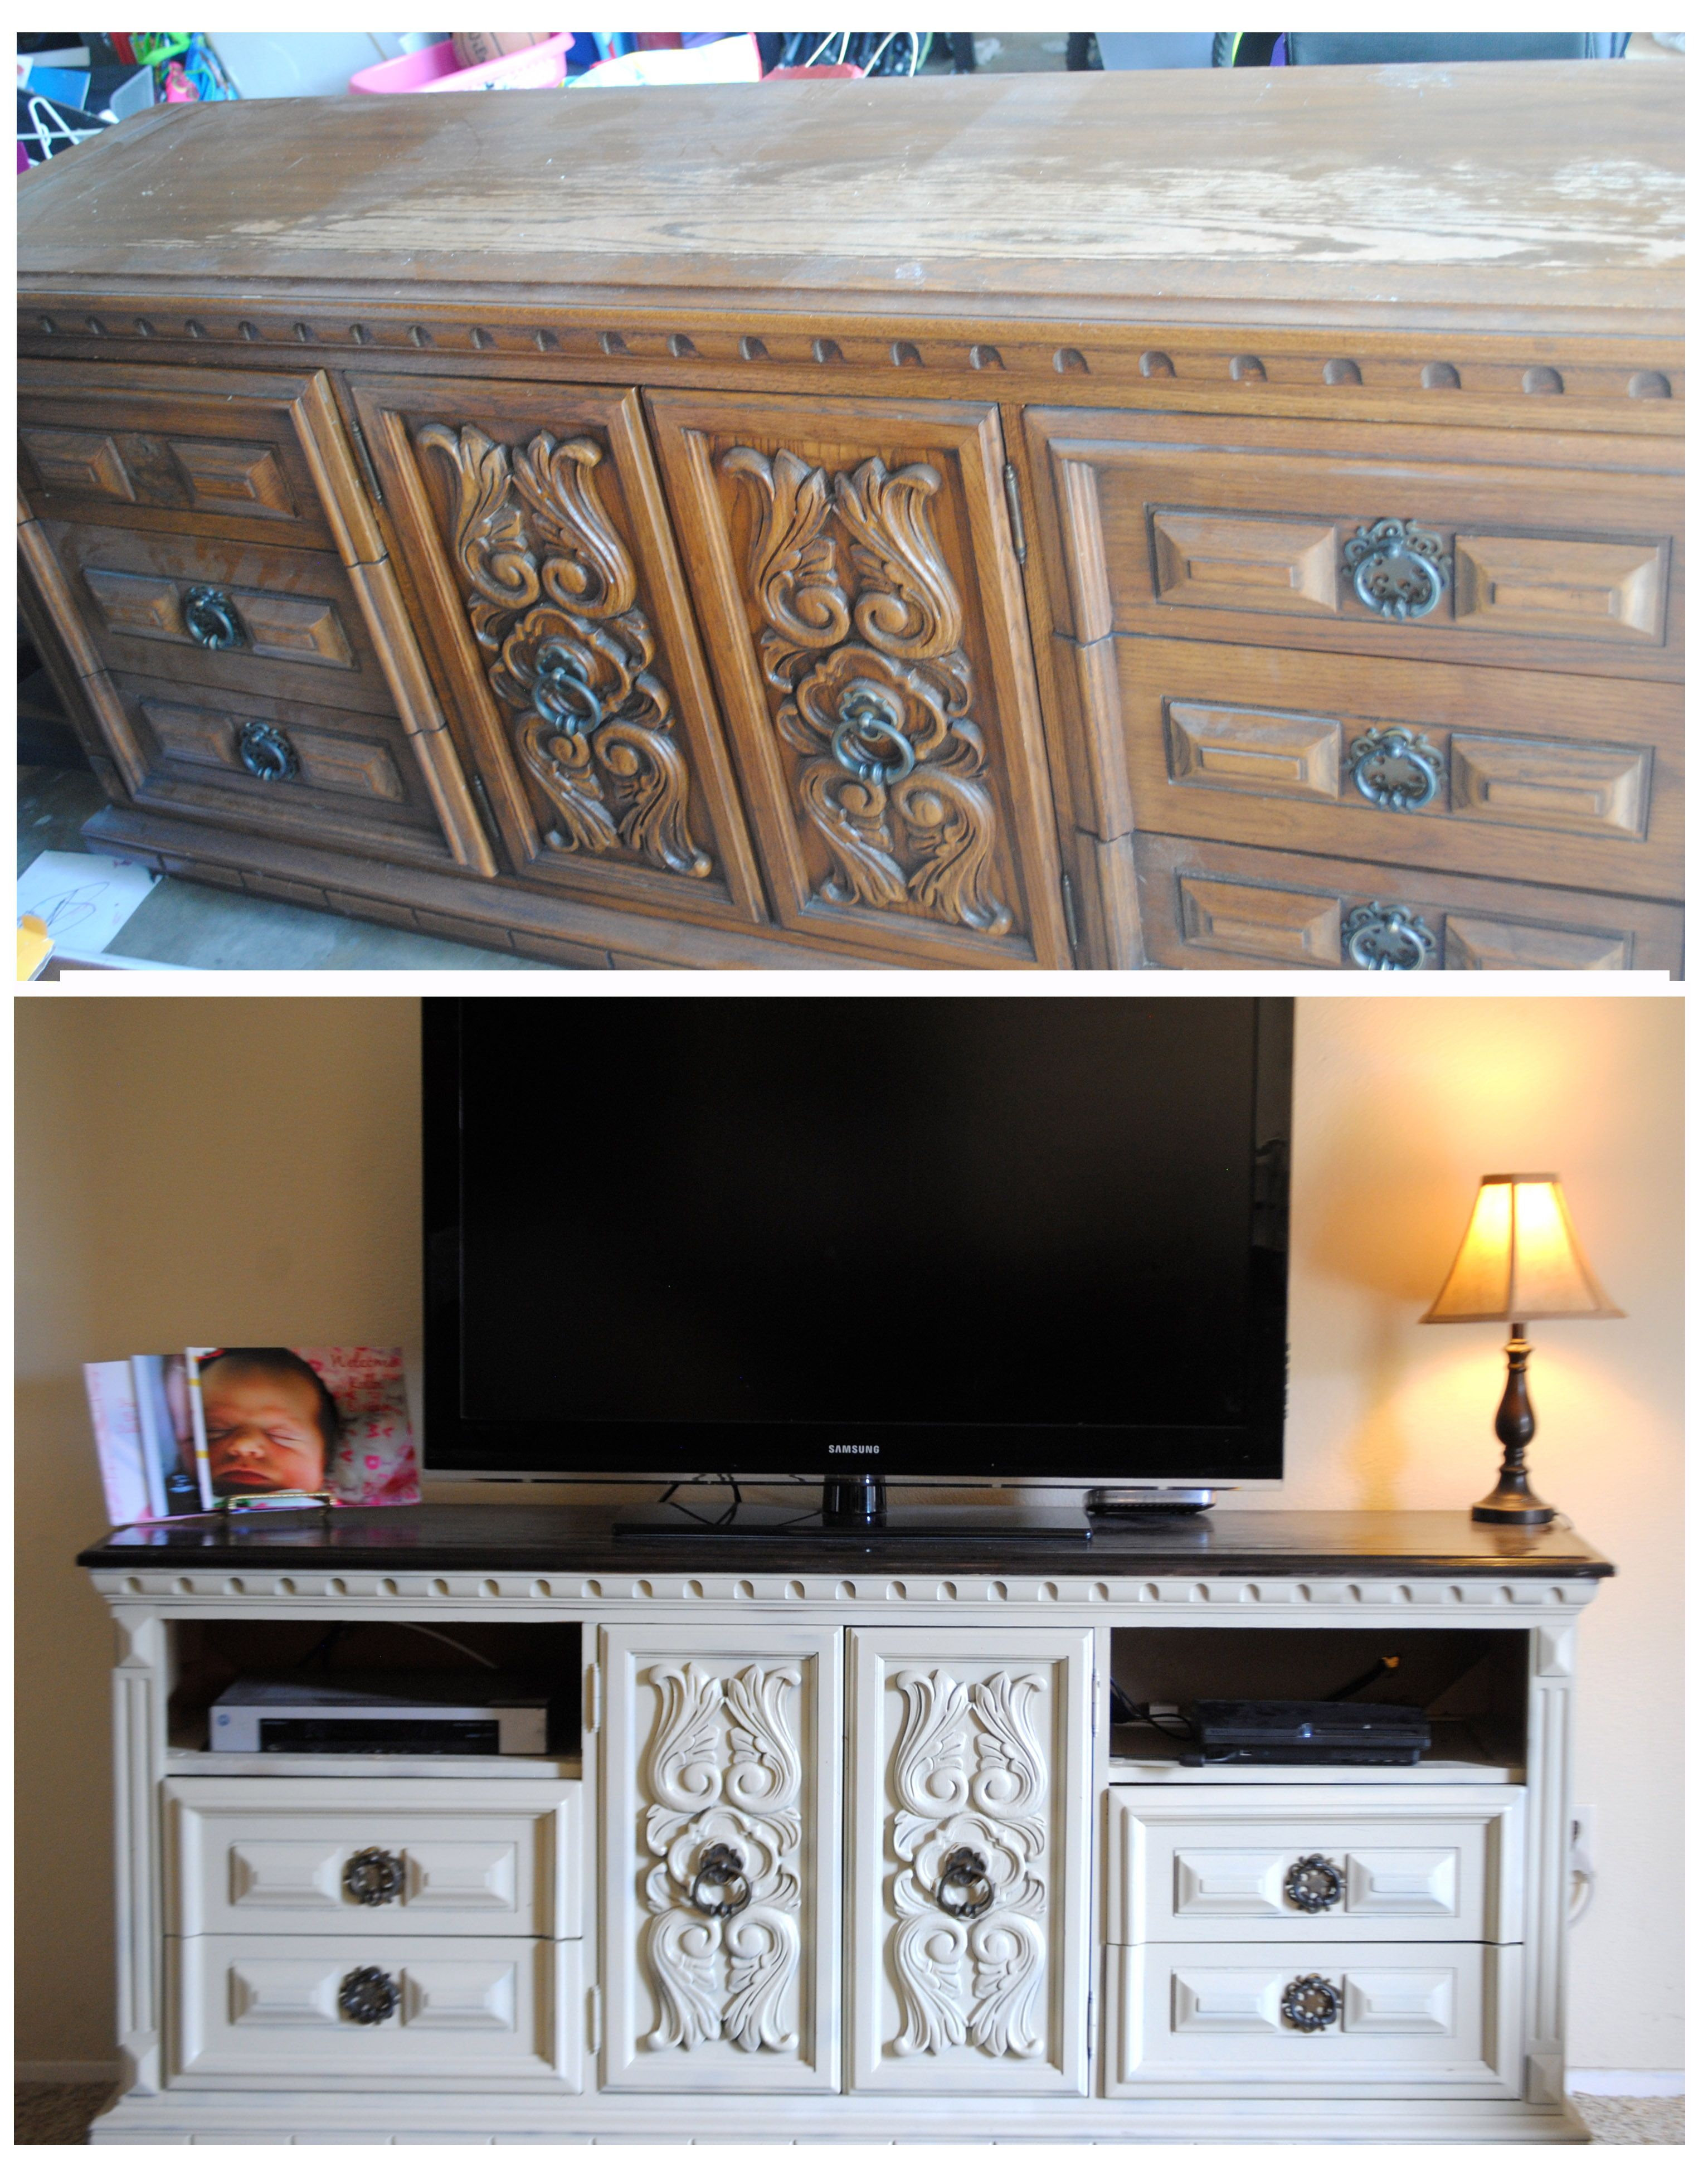 Dove Wood Dresser Garage Sale Find Turned Tv Stand Diy Before And After Spray Color Almond St Repurposed Furniture Furniture Makeover Refurbished Furniture